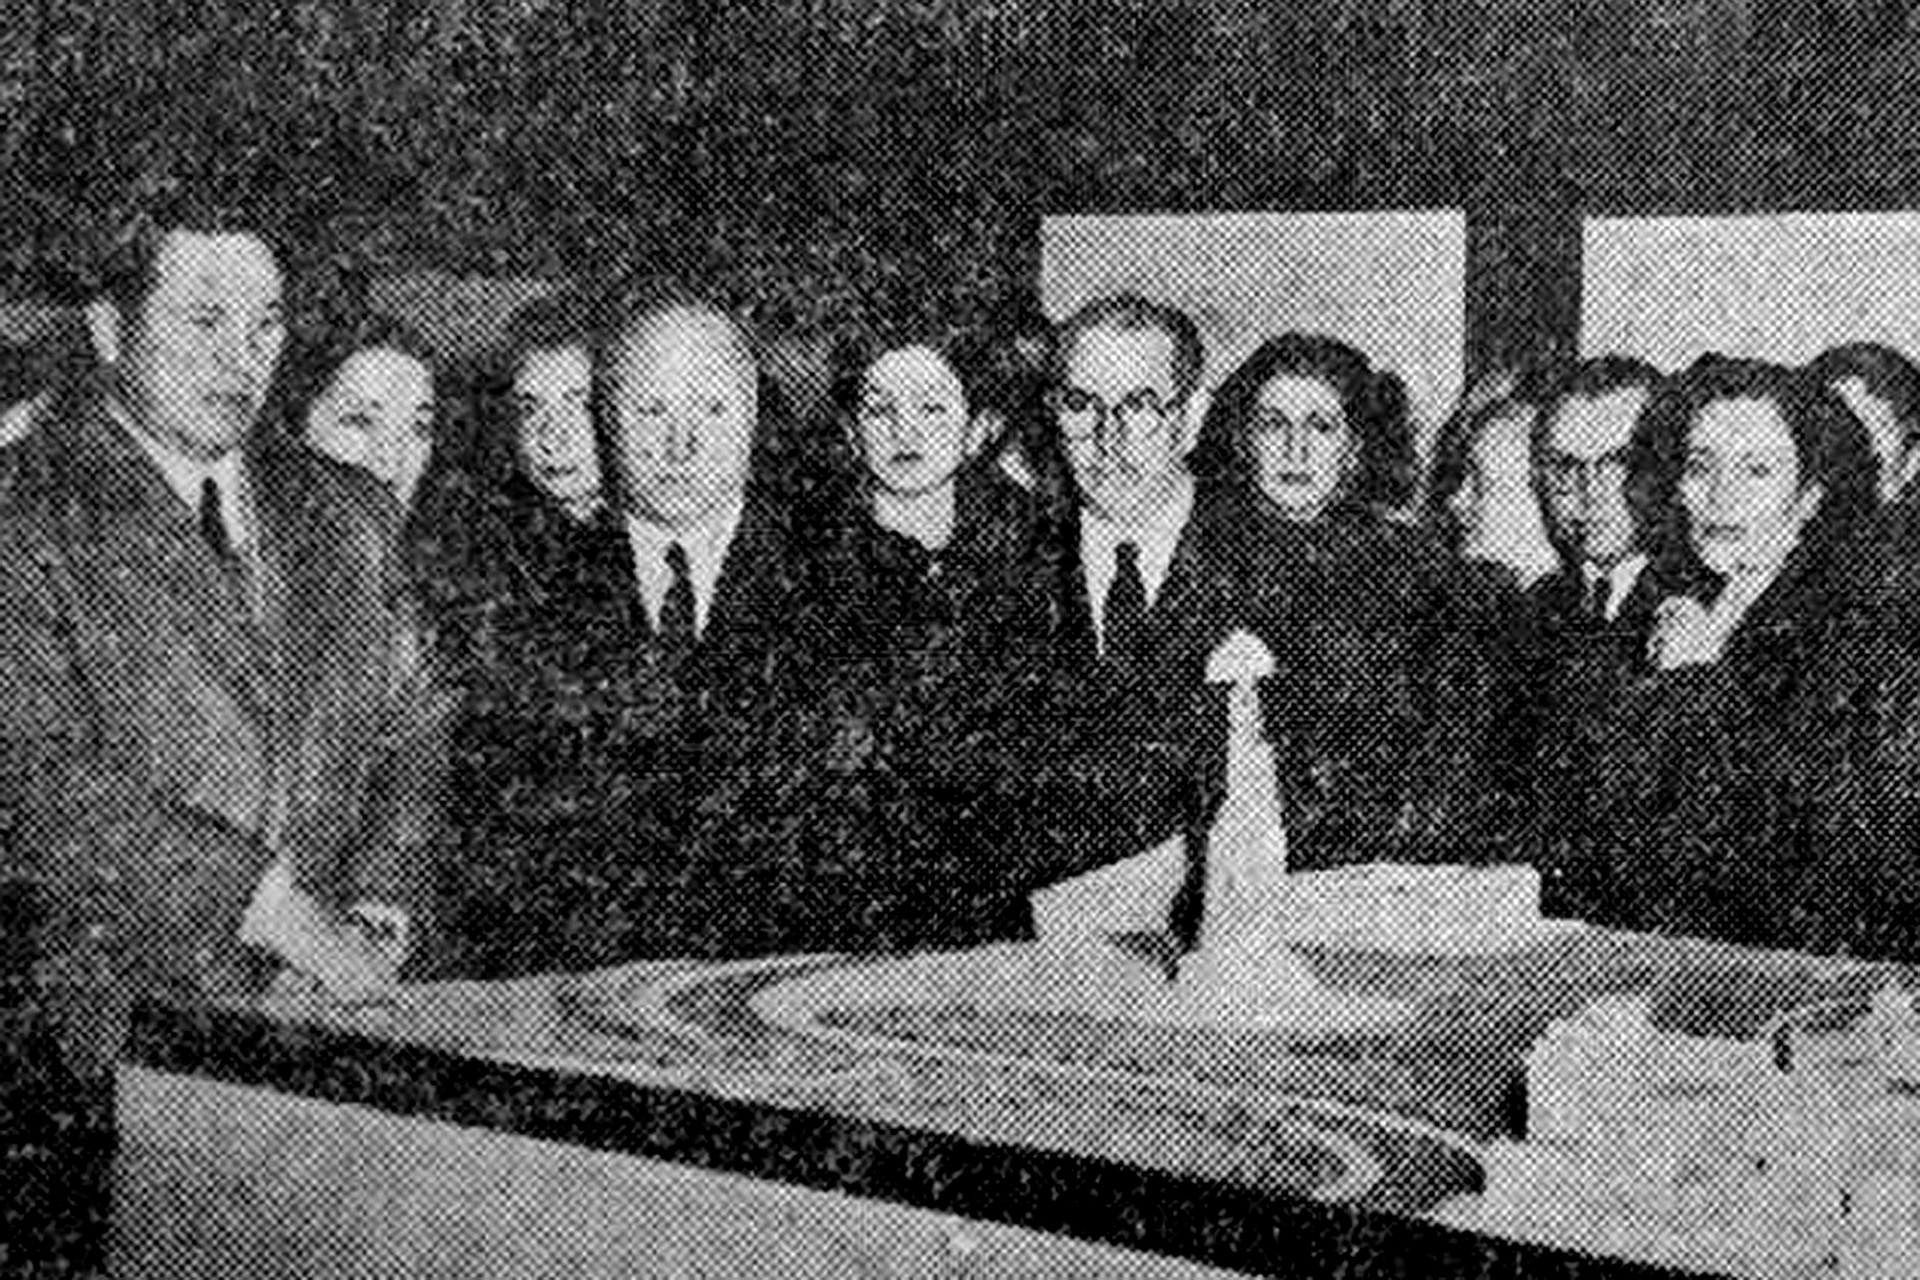 El general Perón frente a la maqueta de la obra. El hombre de lentes es el escultor, Leone Tommasi